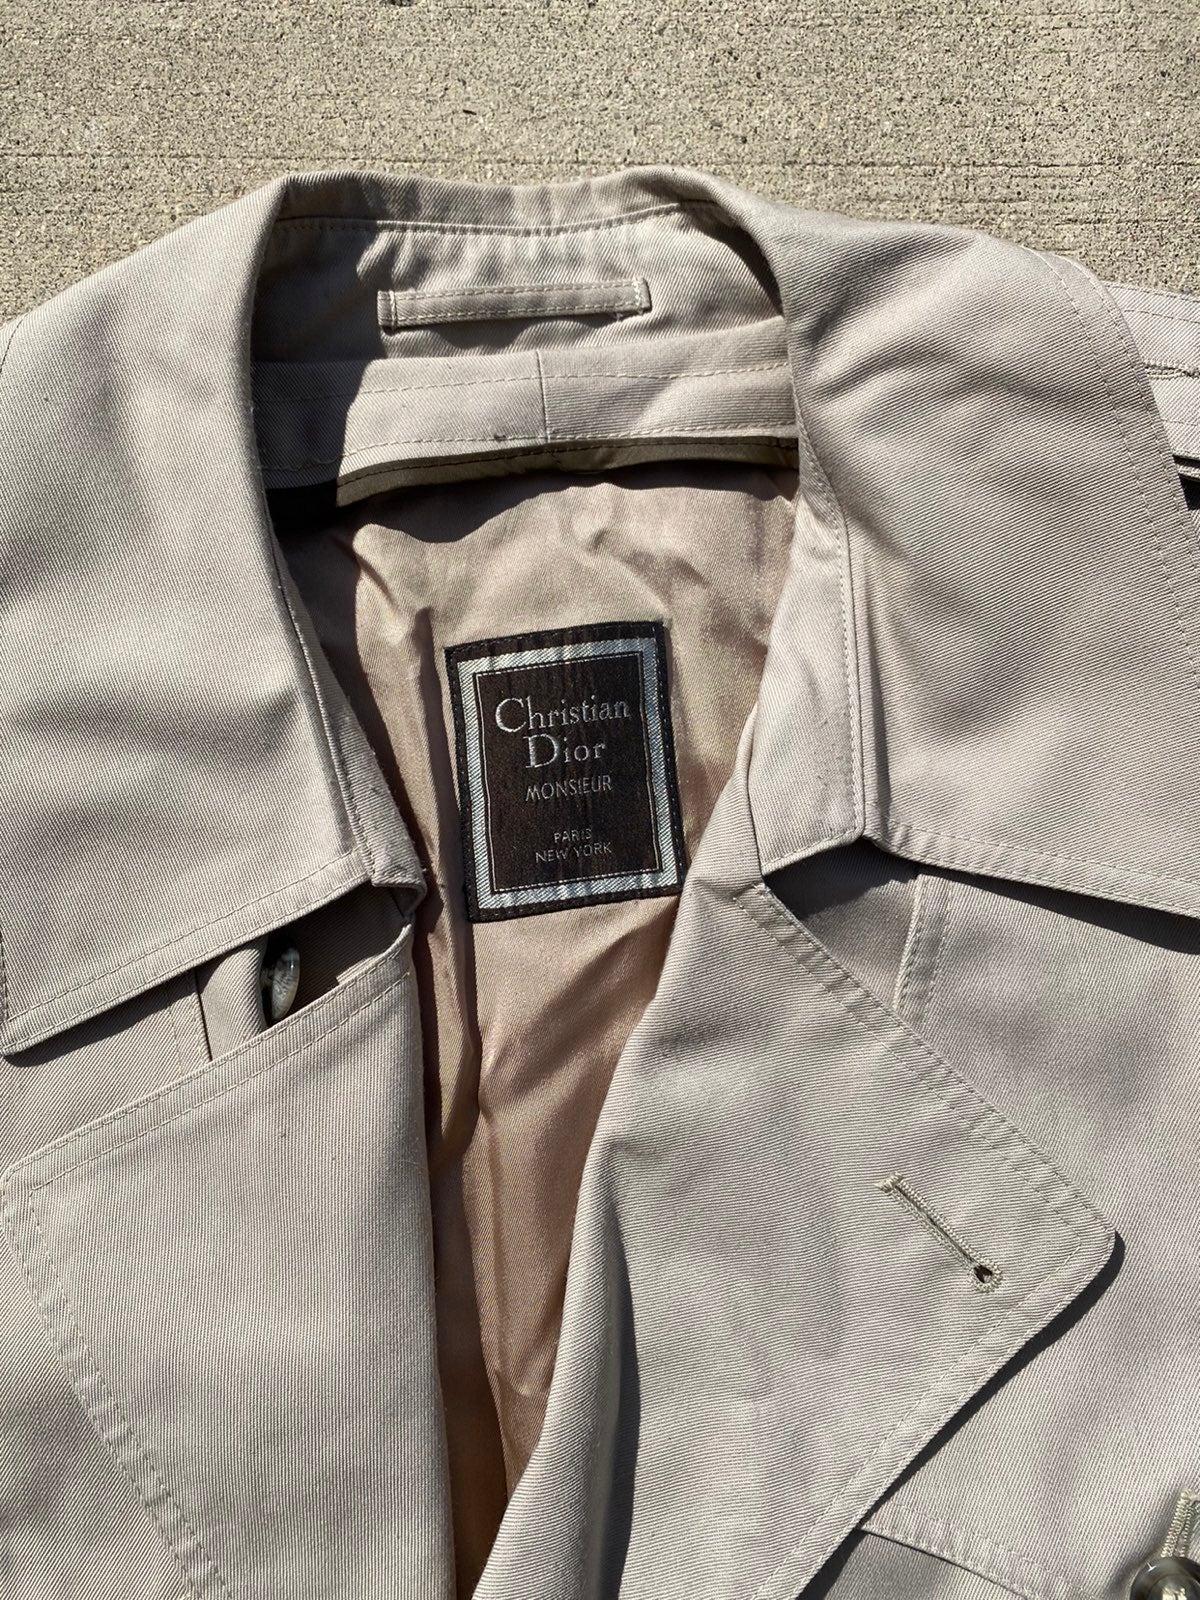 Christian Dior Beige Cream Trench Coat